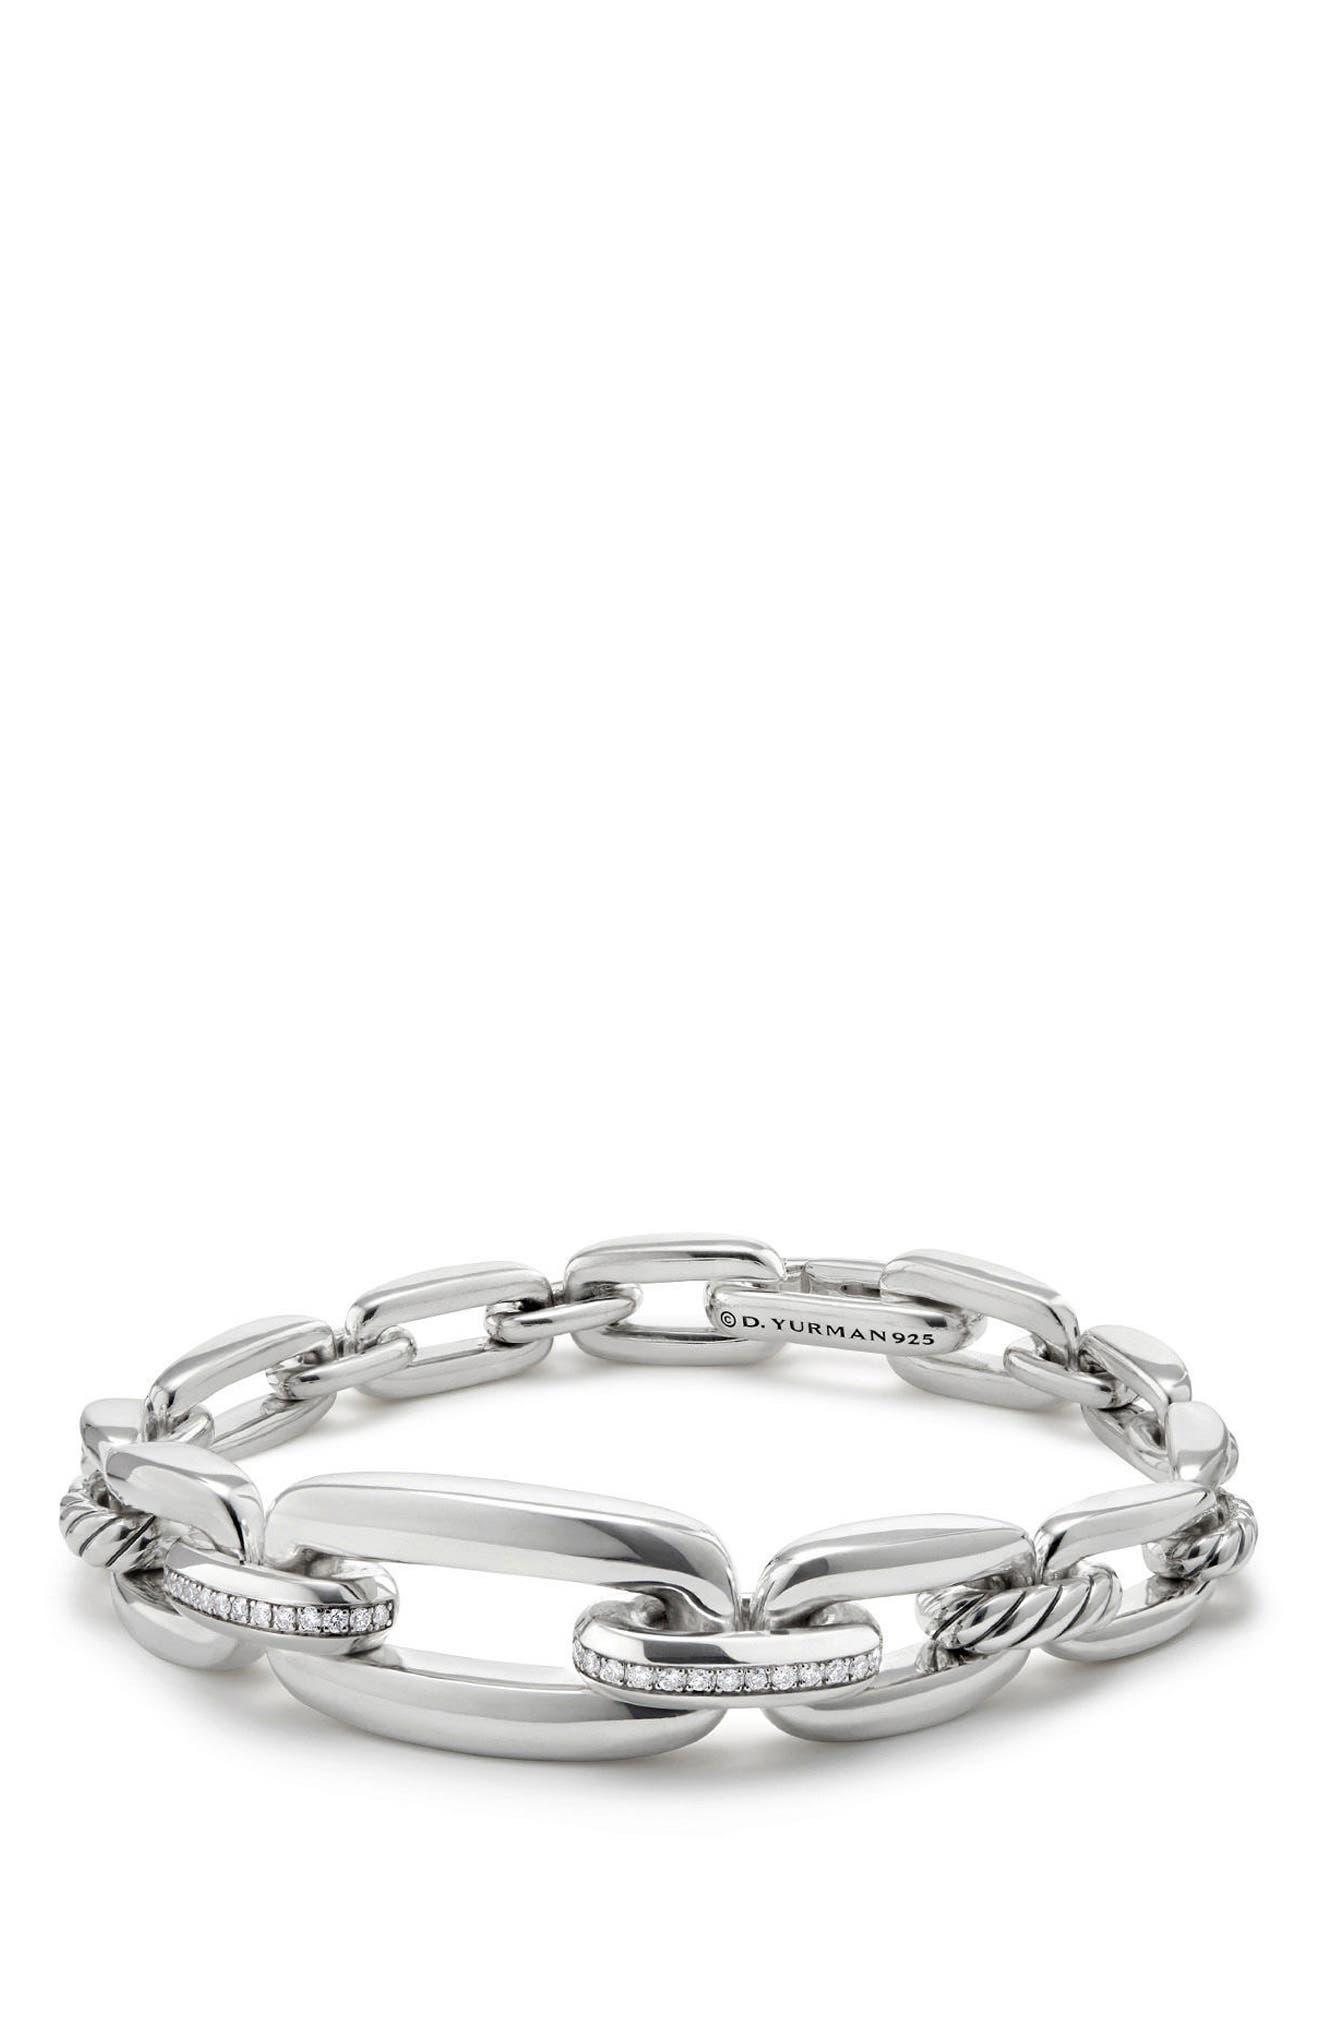 David Yurman Wellesley Chain Link Bracelet with Diamonds